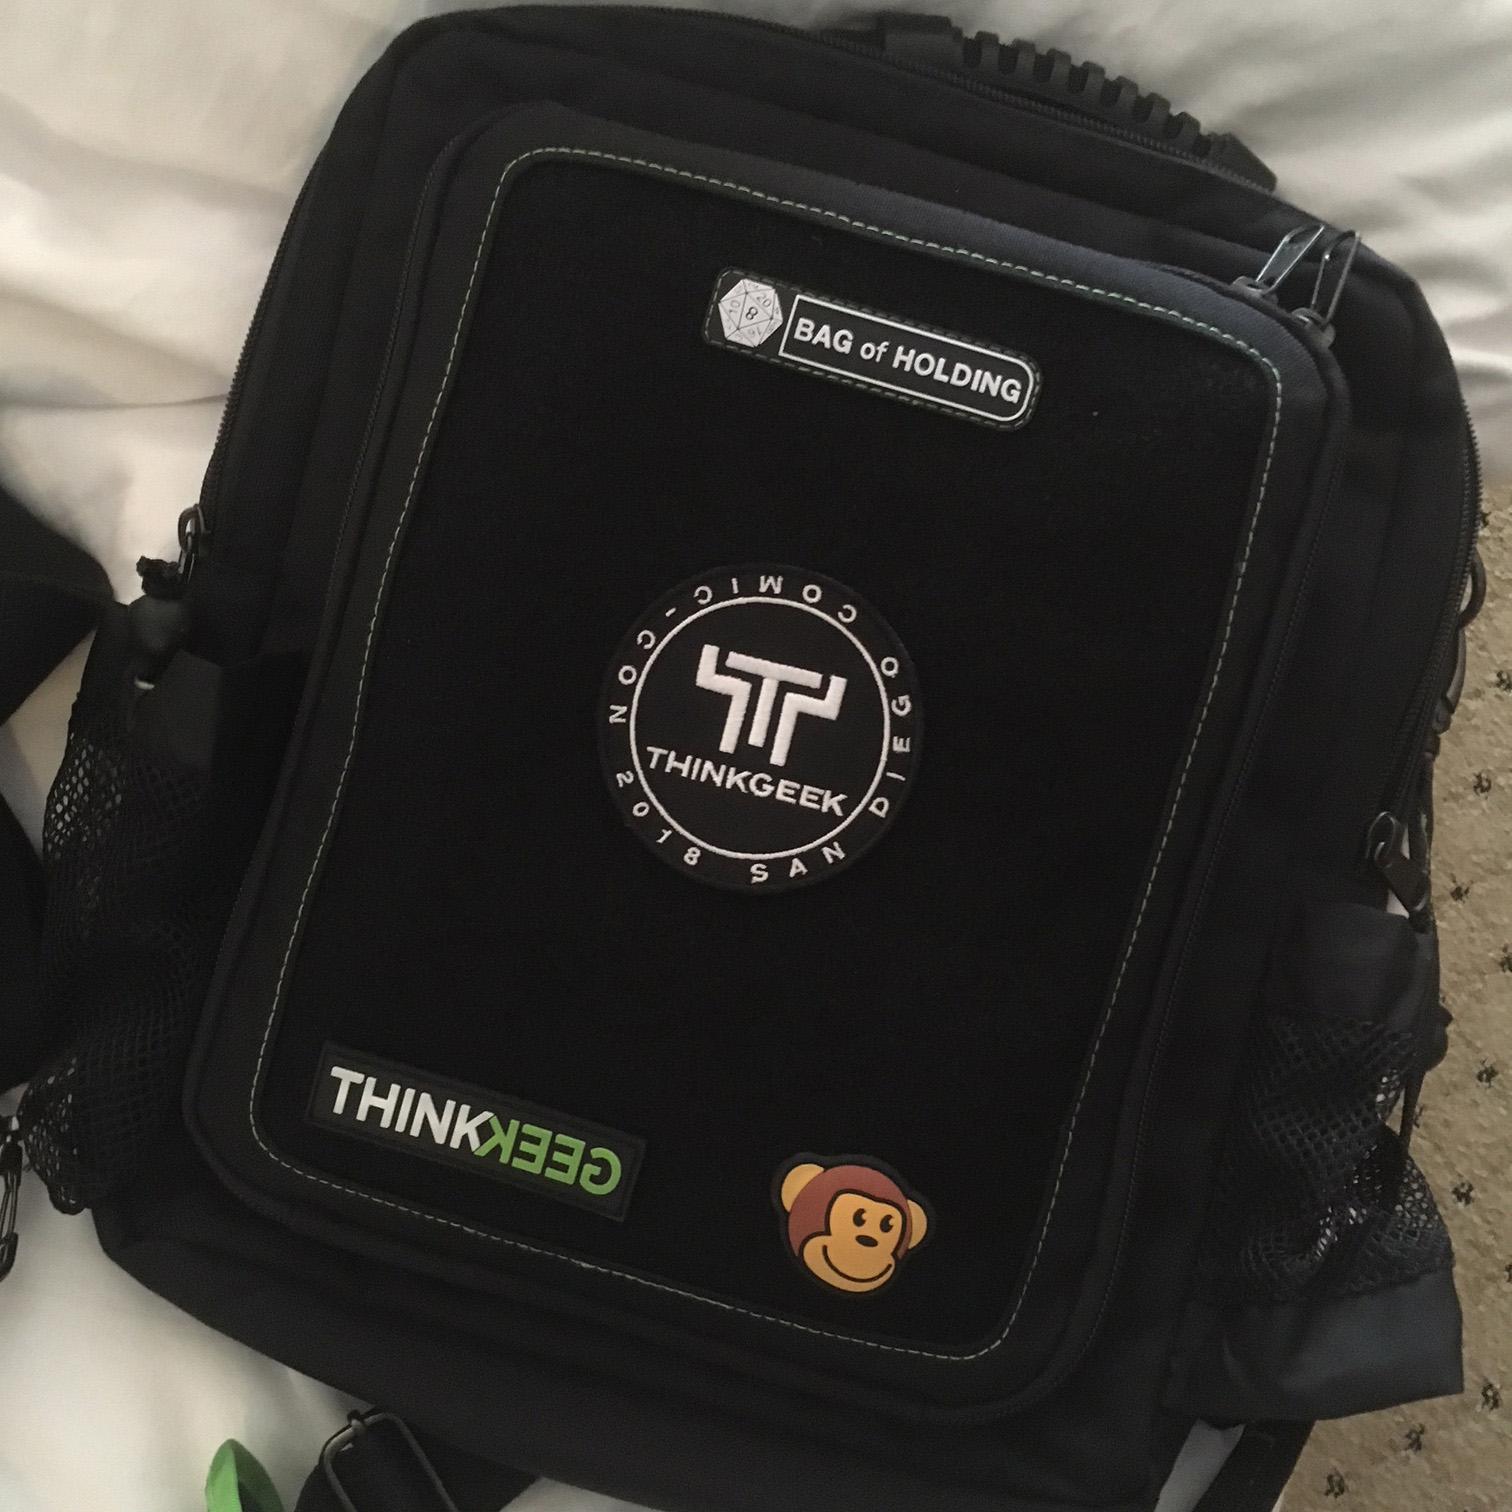 Bag-of-Holding-1-b